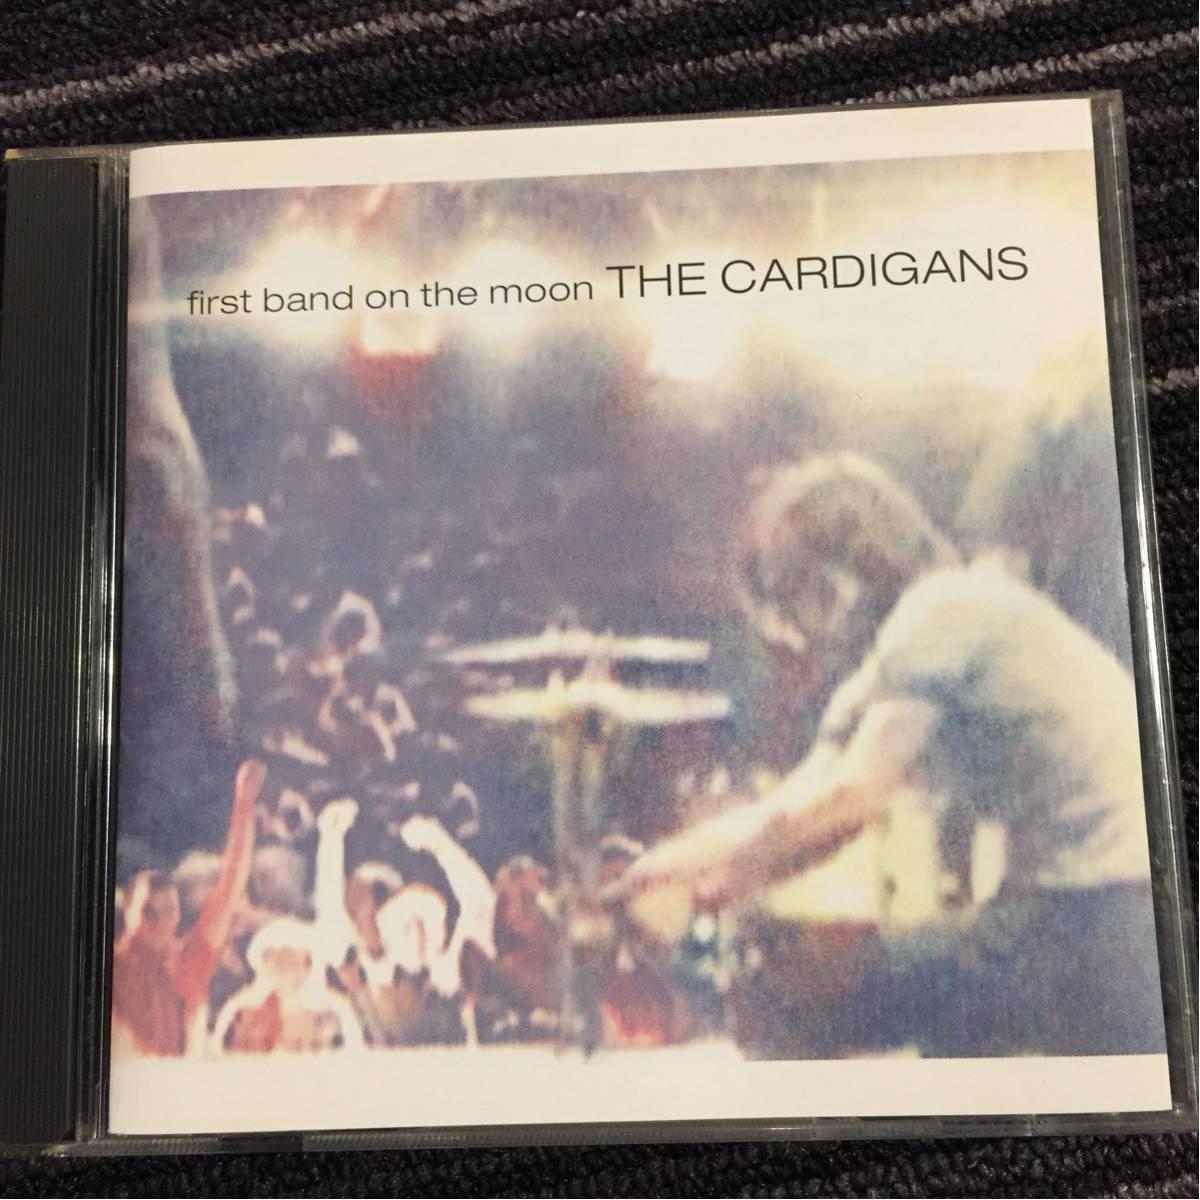 THE CARDIGANSカーディガンズ/ FIRST BAND ON THE MOONファースト・バンド・オン・ザ・ムーン_画像1